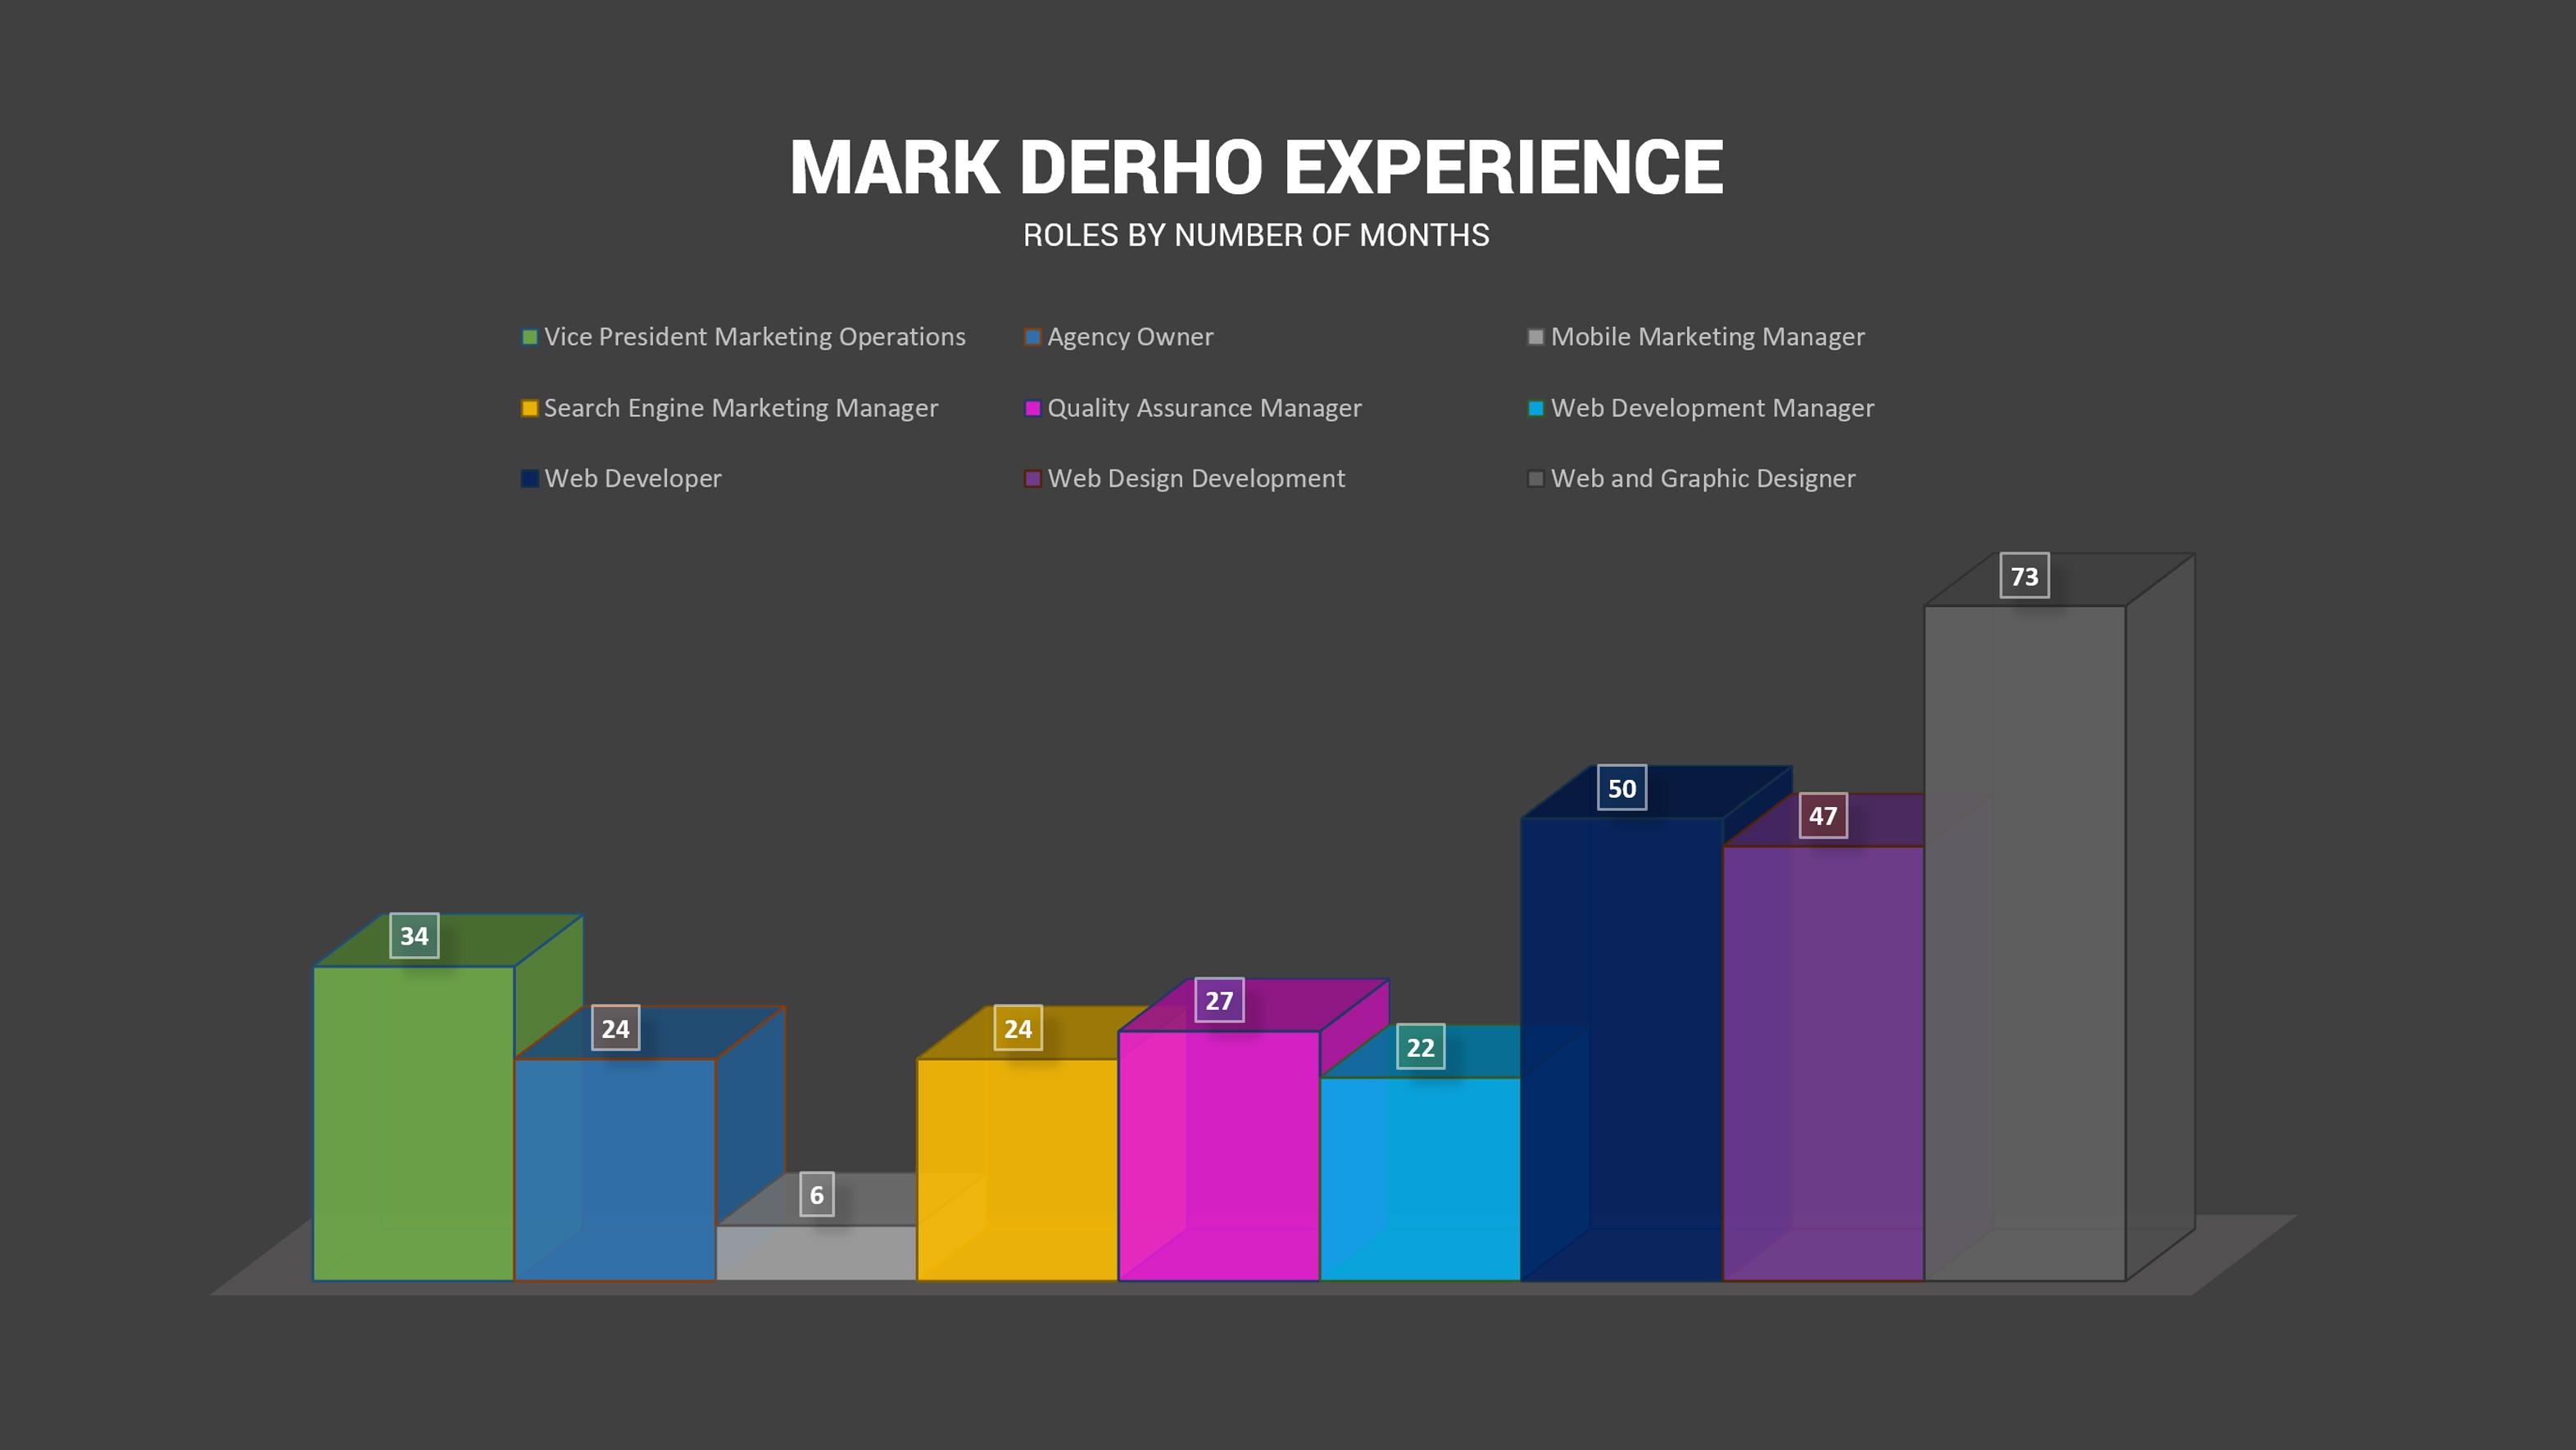 Mark Derho's employment experience,